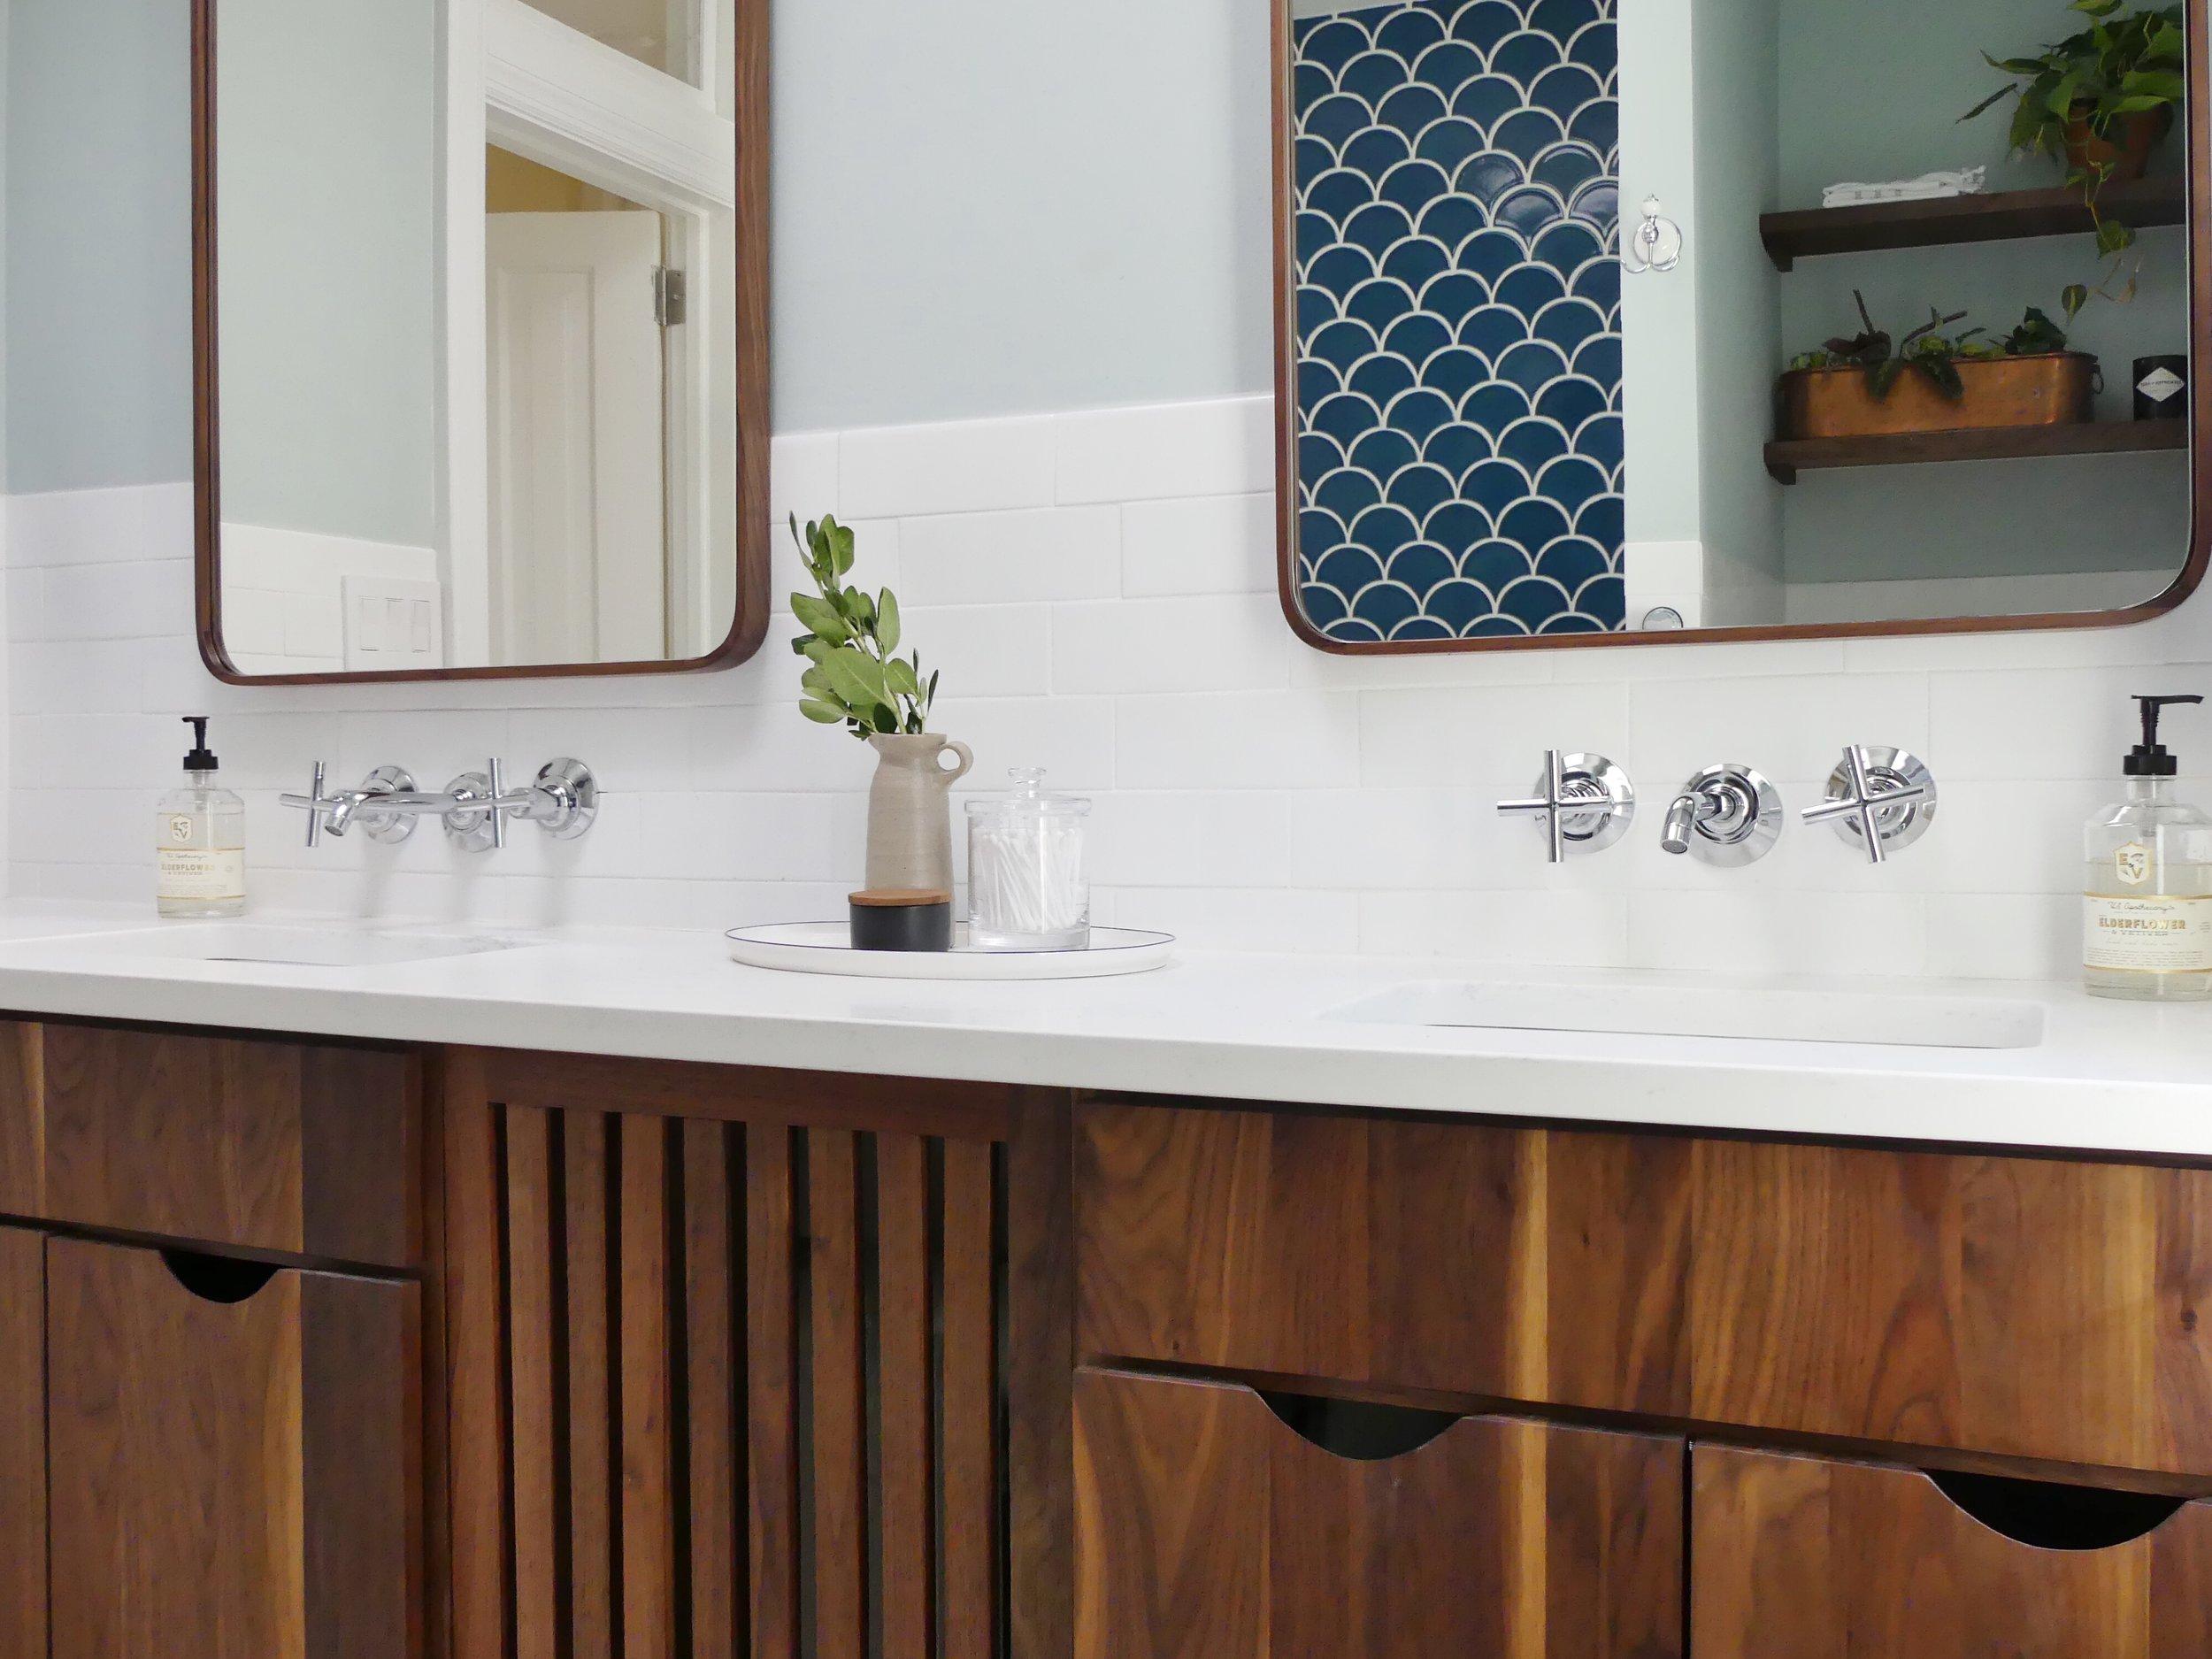 sanabria-interior-design-washington-dc-bathroom-renovation-custom-cabinets